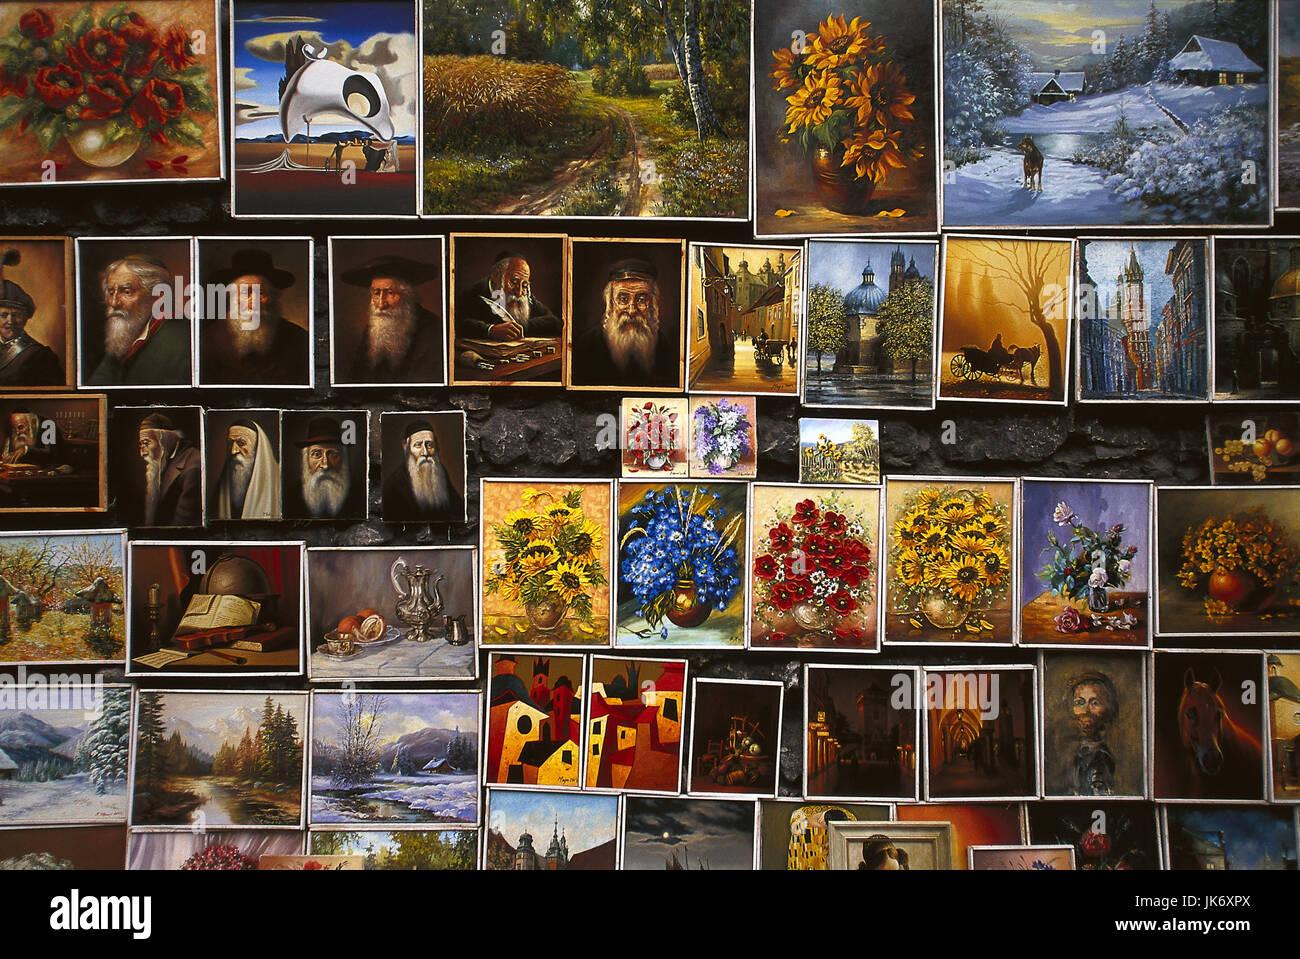 Polen, Krakow, Verkauf, Miniaturgemälde,  Detail  Europa,  Rzeczpospolita Polska, Kleinpolen, Gebietshauptstadt, - Stock Image